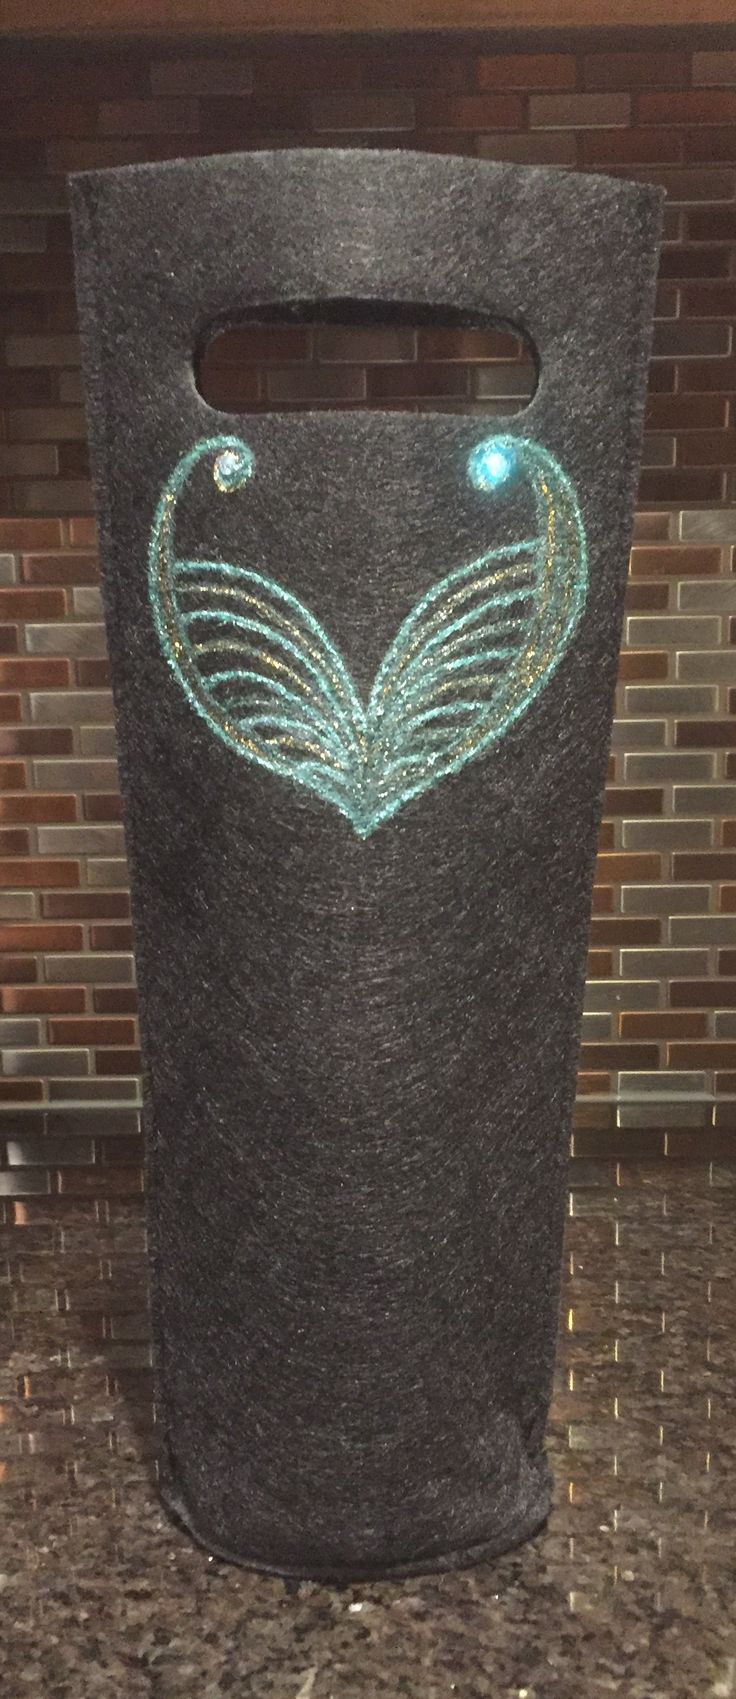 """Mermaids Dream"" #HandpaintedWineTote #MyEscapeArtDesigns #MelodyGermain #ChaptersMacleodTrail #yyc  www.myescapeart.ca"